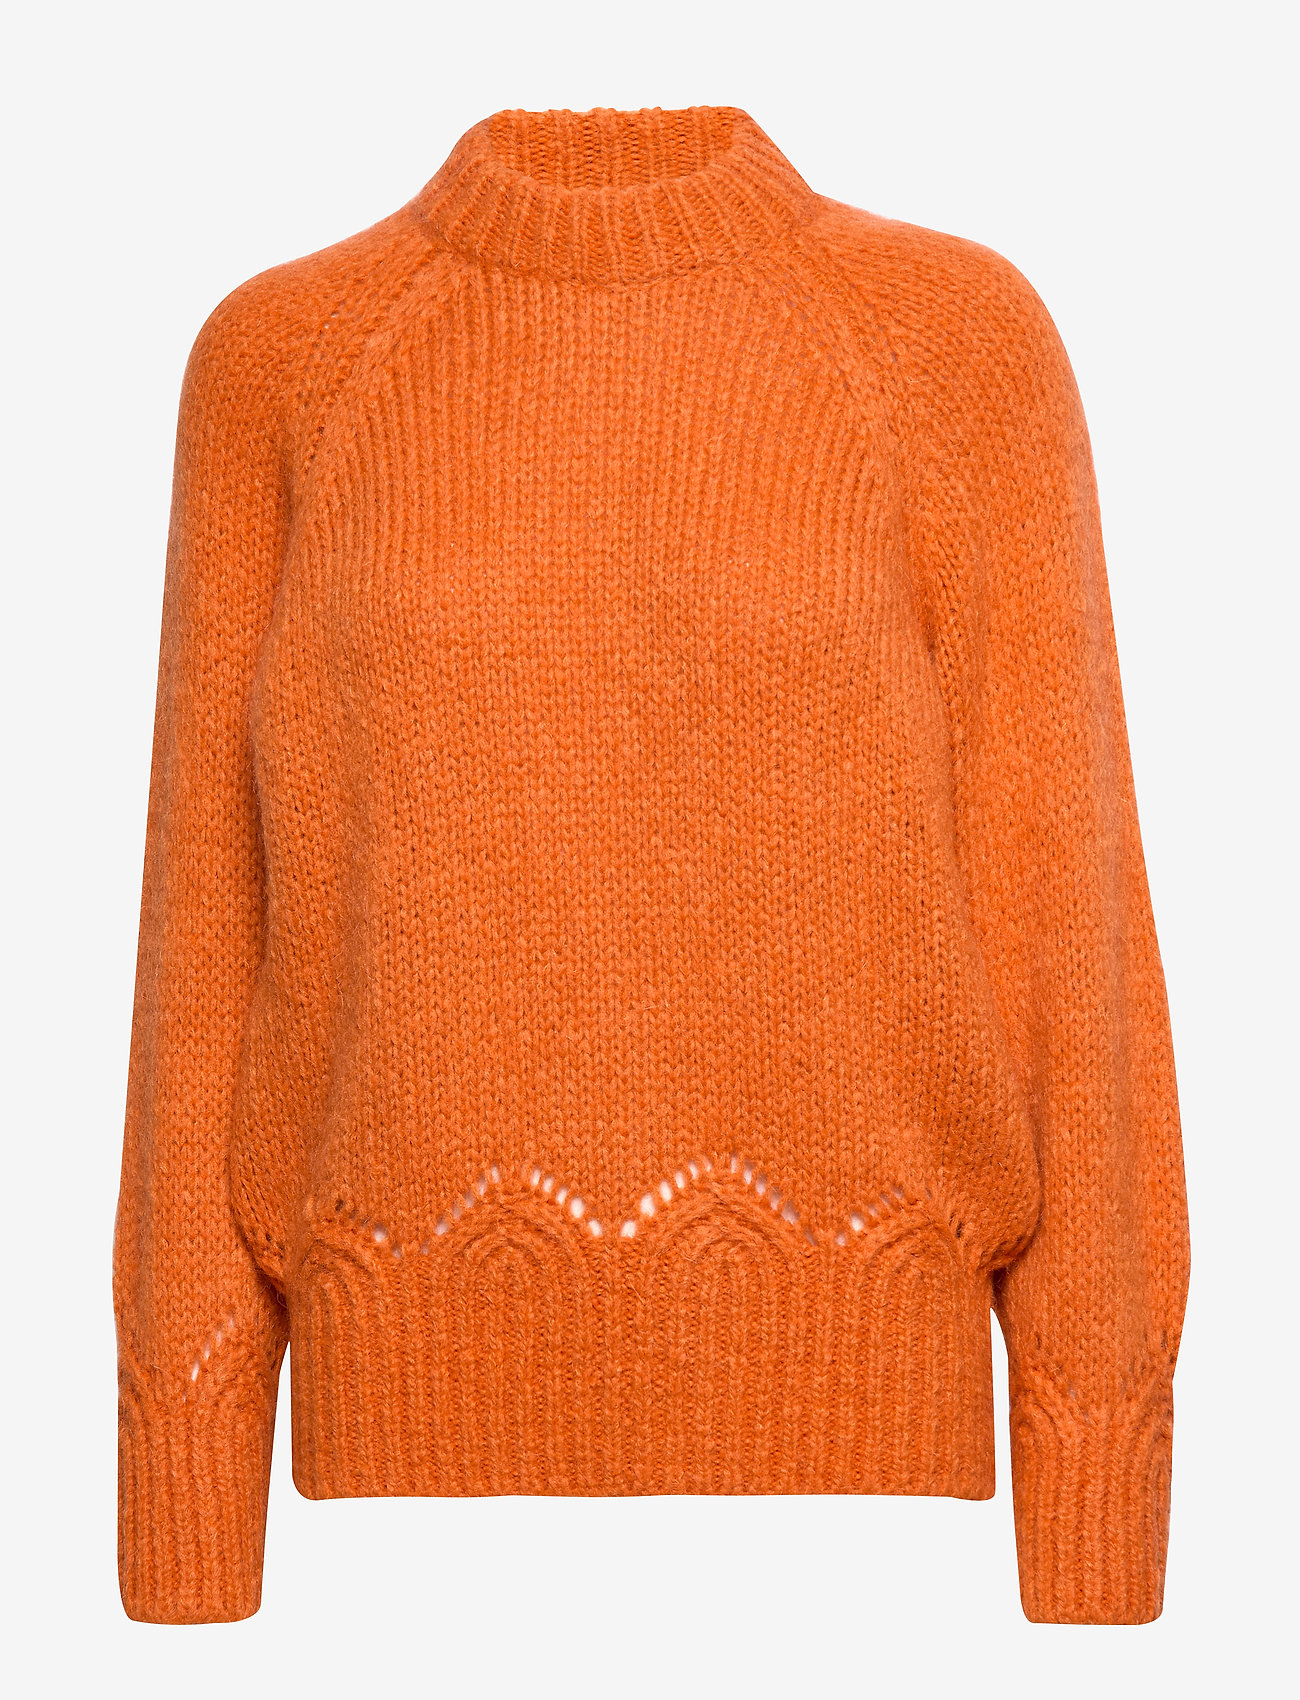 ODD MOLLY - Novelty Sweater - turtlenecks - sunset orange - 1